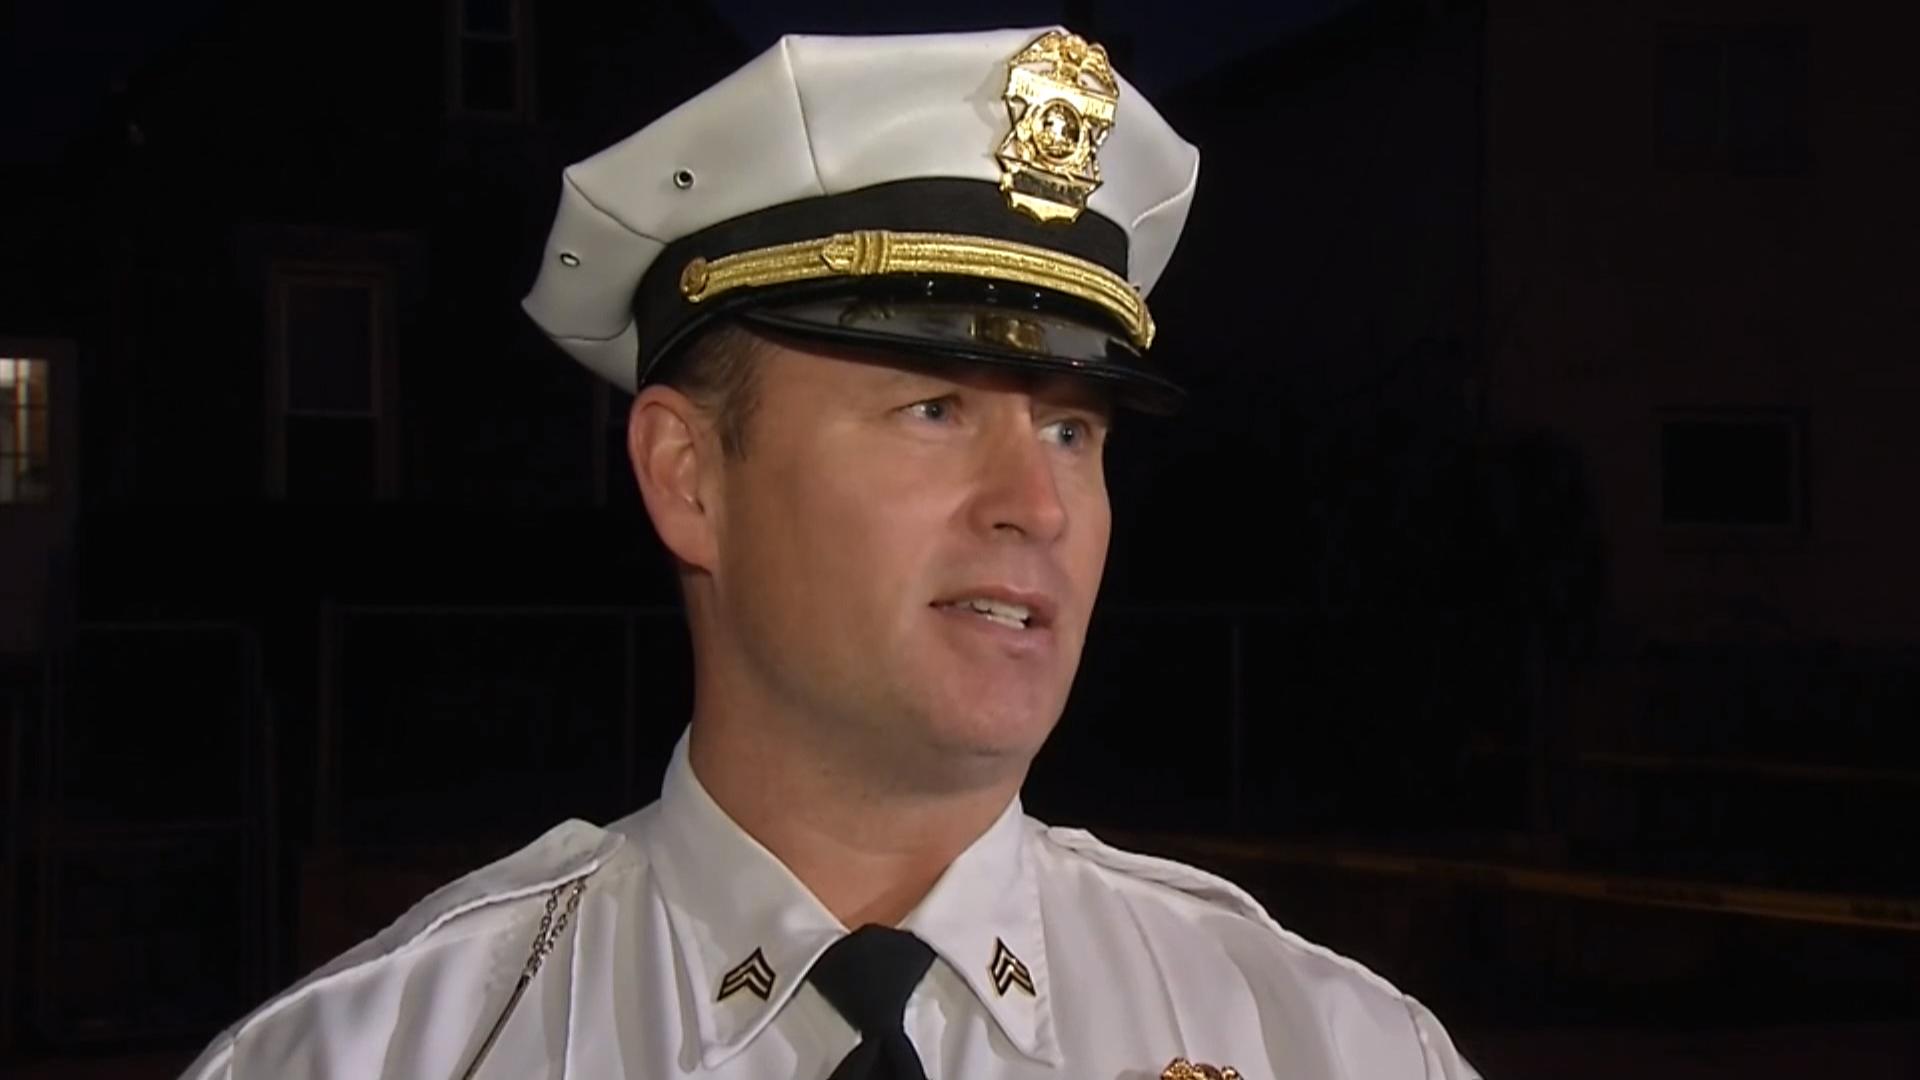 Ohio State Player Kosta Karageorge's Body Found in Dumpster: Police